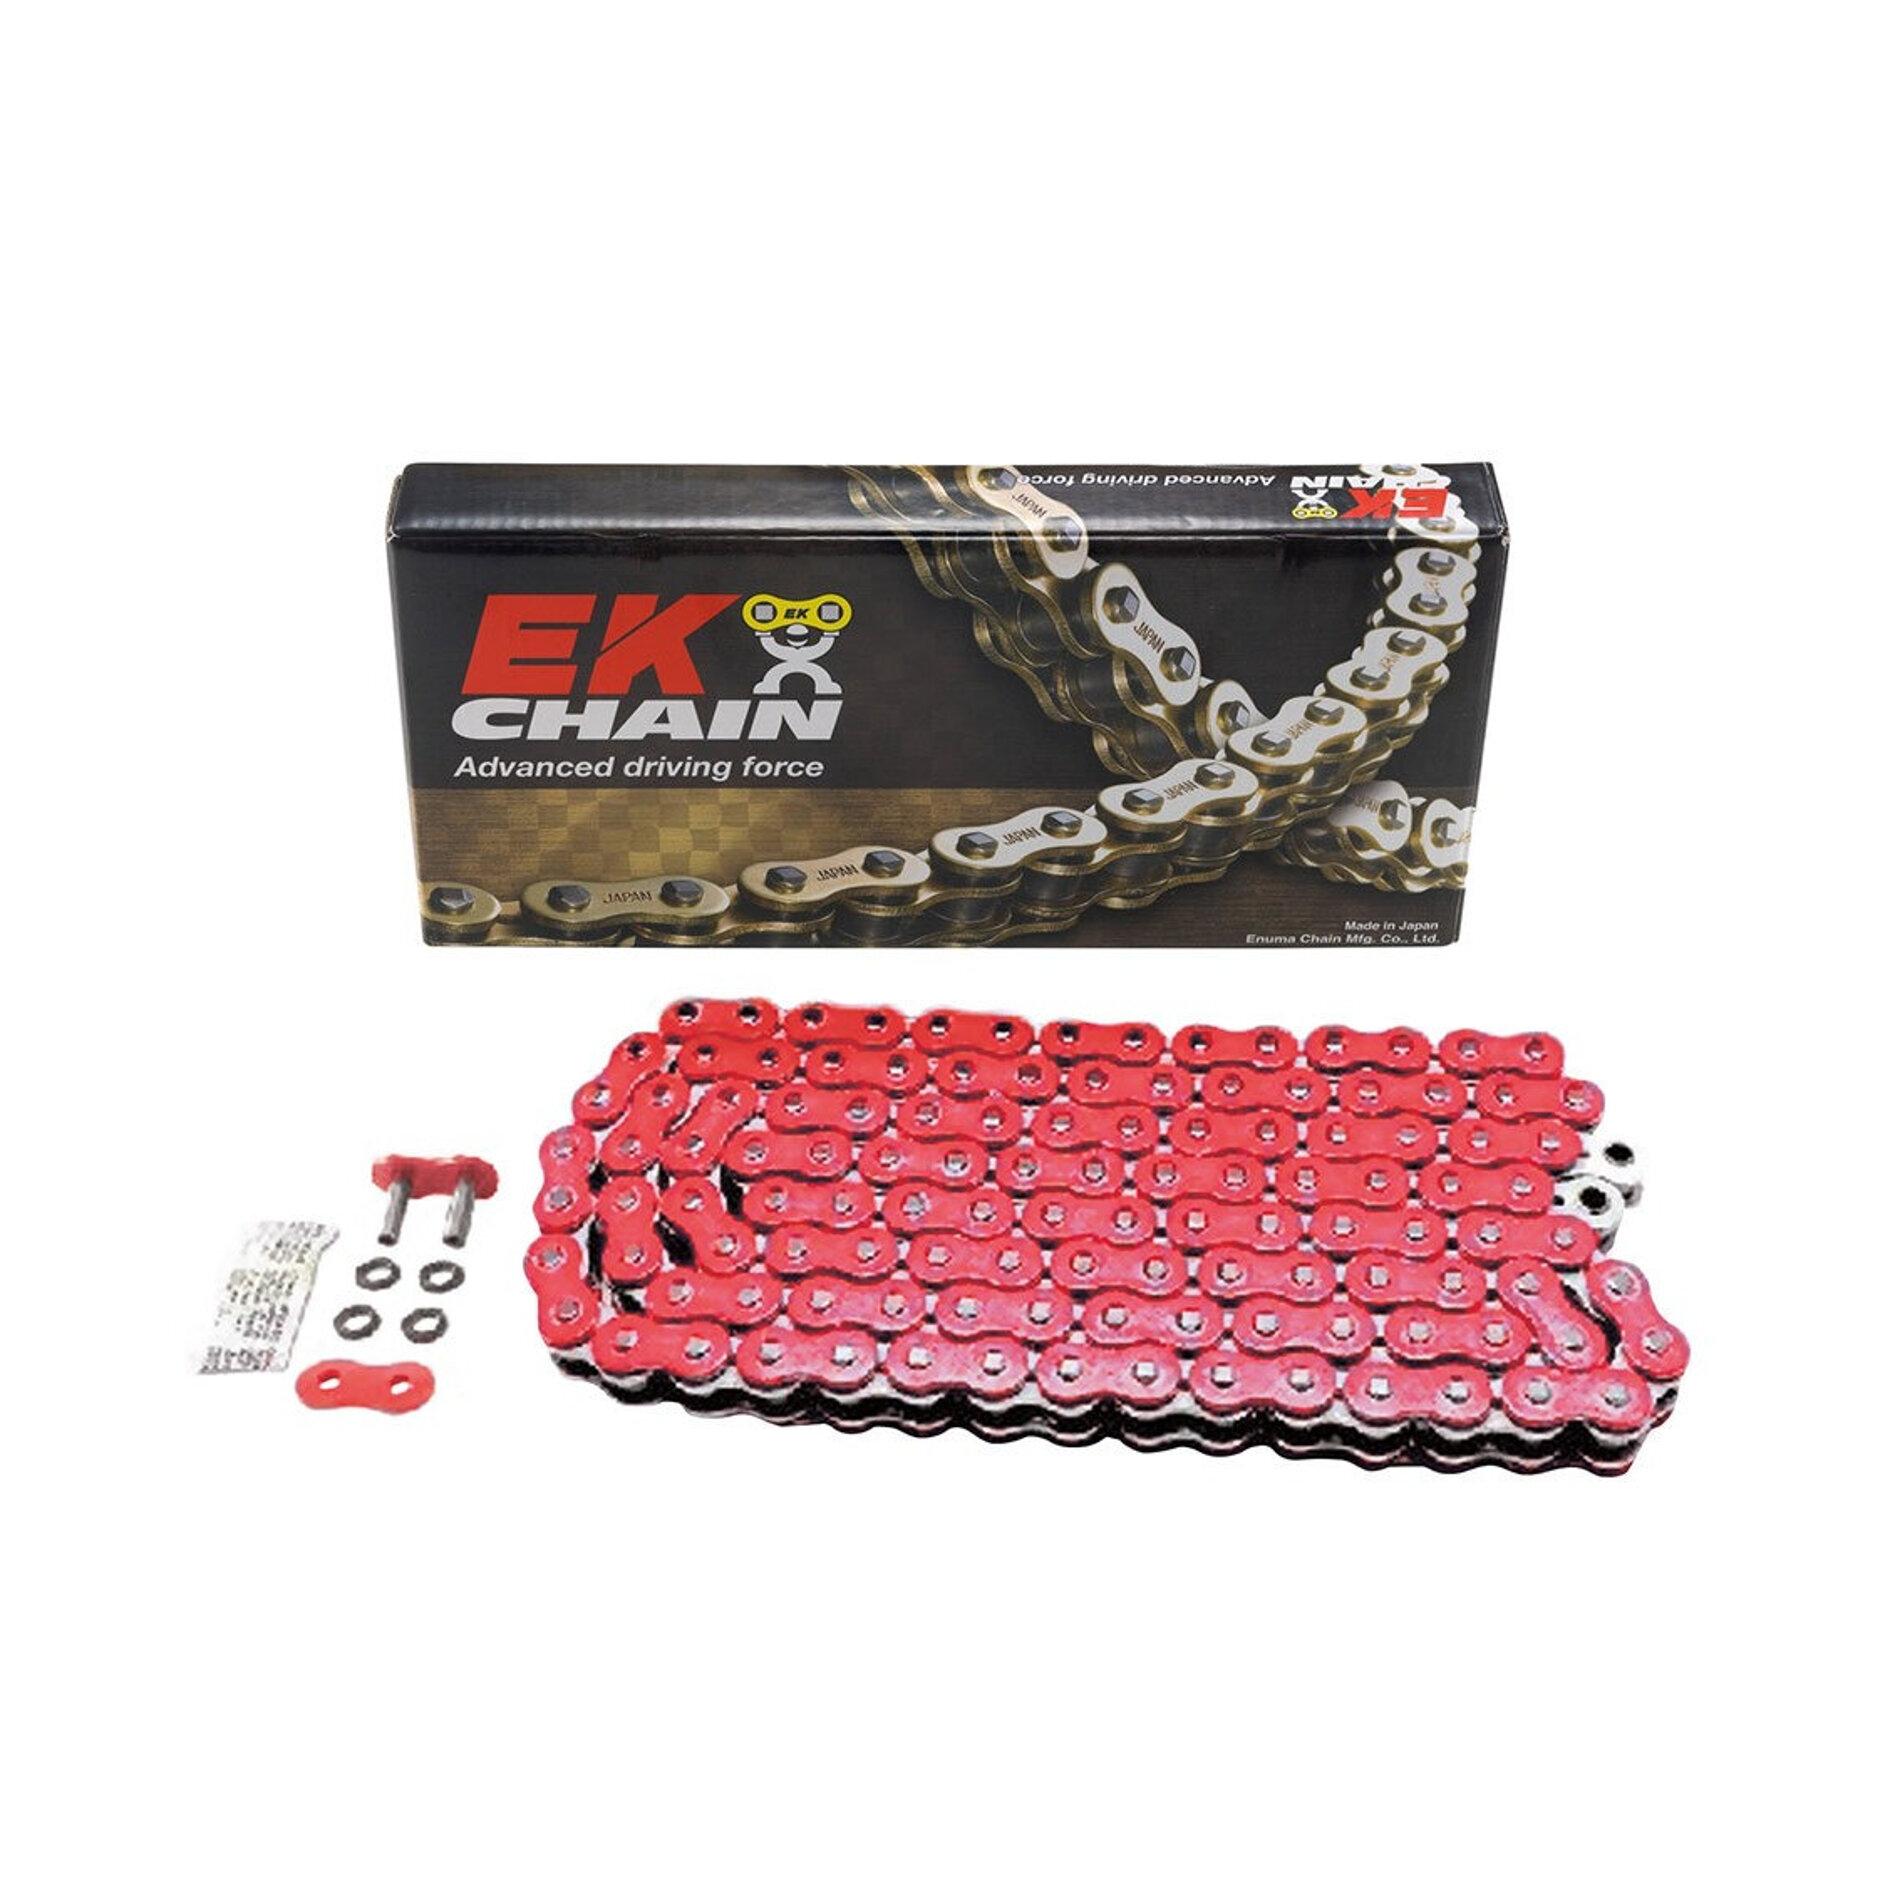 Chaîne EK 525 QX-Ring 120 maillons rouge